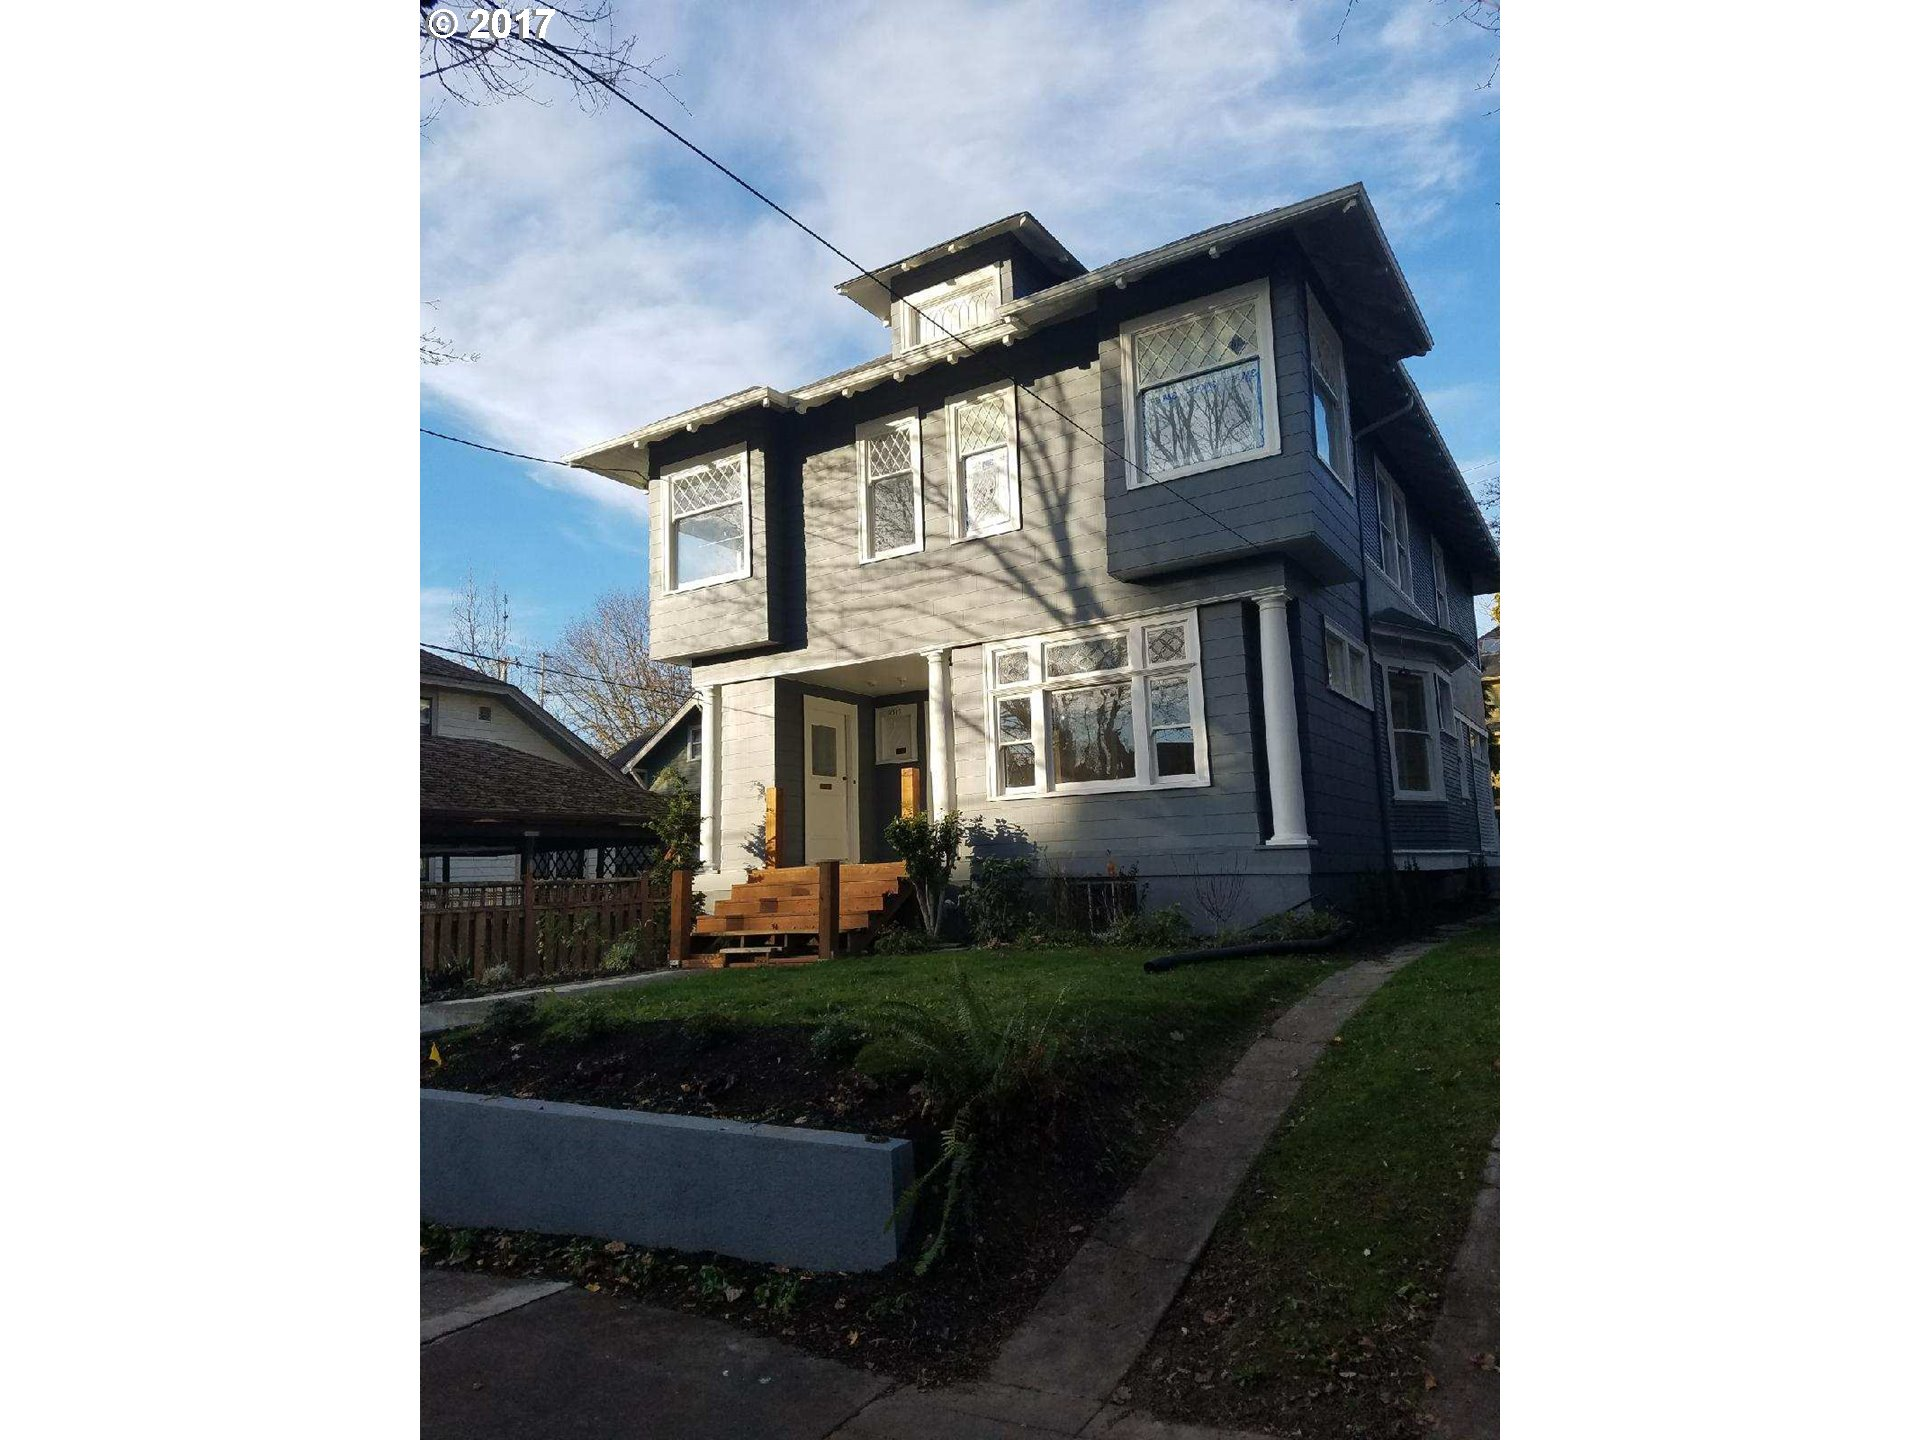 2315 SE SALMON ST, Portland OR 97214